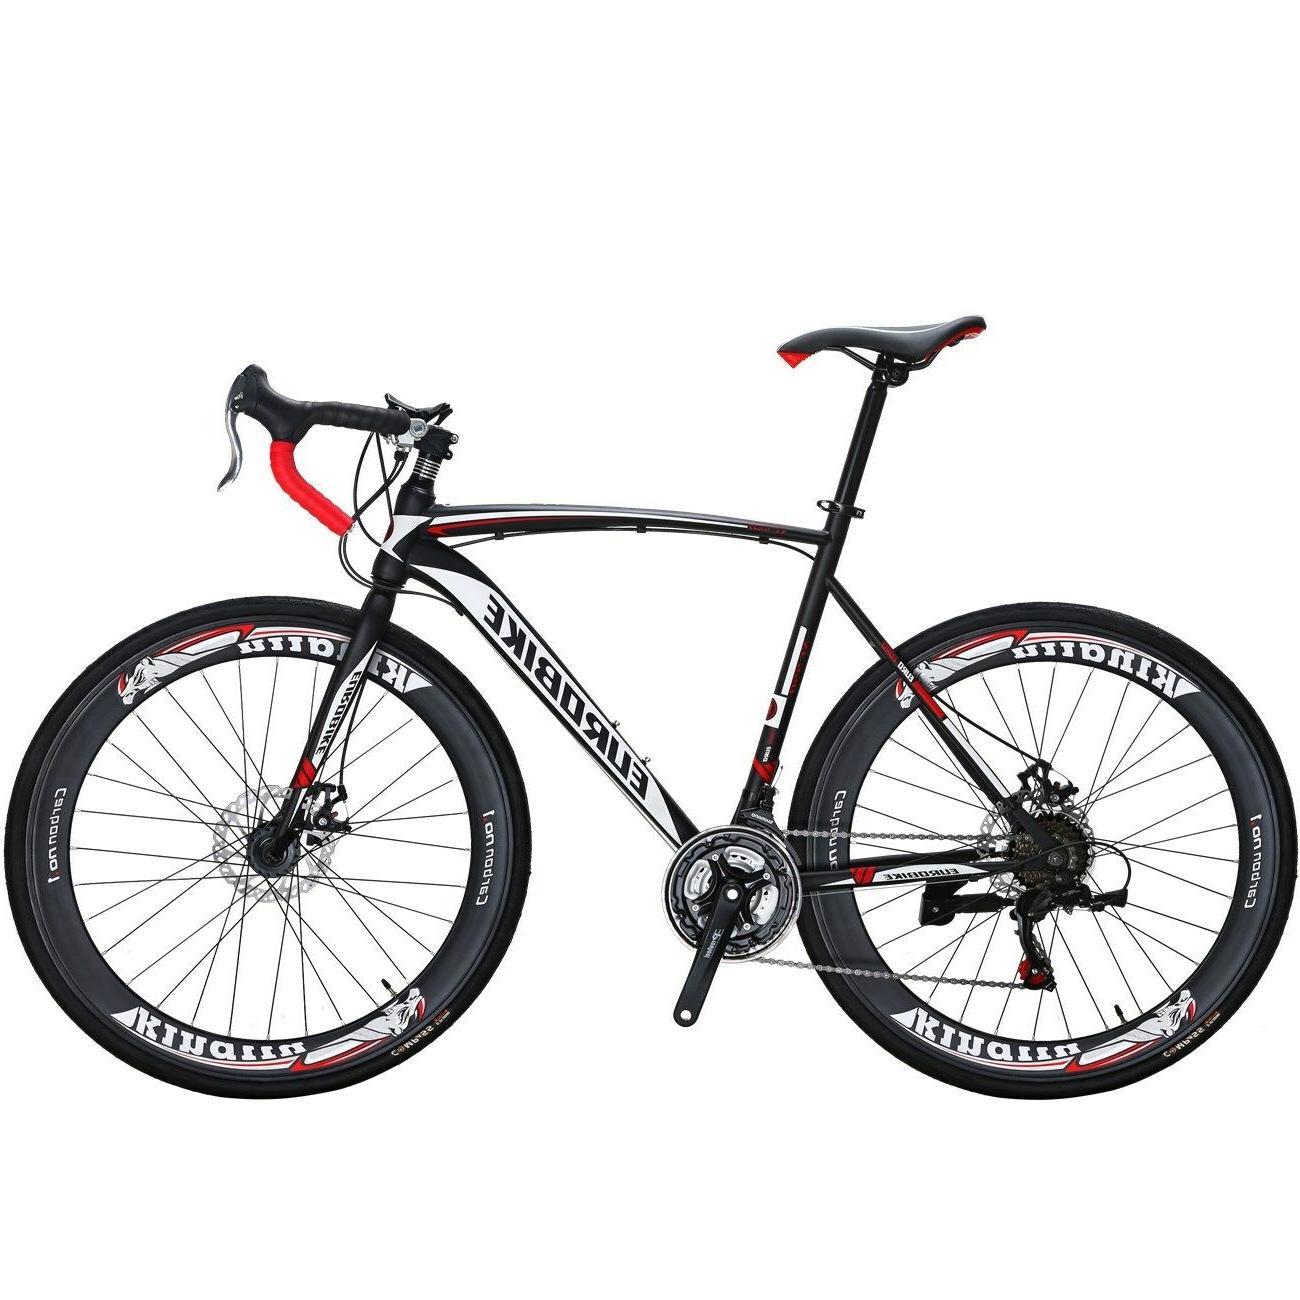 Road Shimano Disc Brake Bicyle Bikes Cycling 54cm 700C Styles